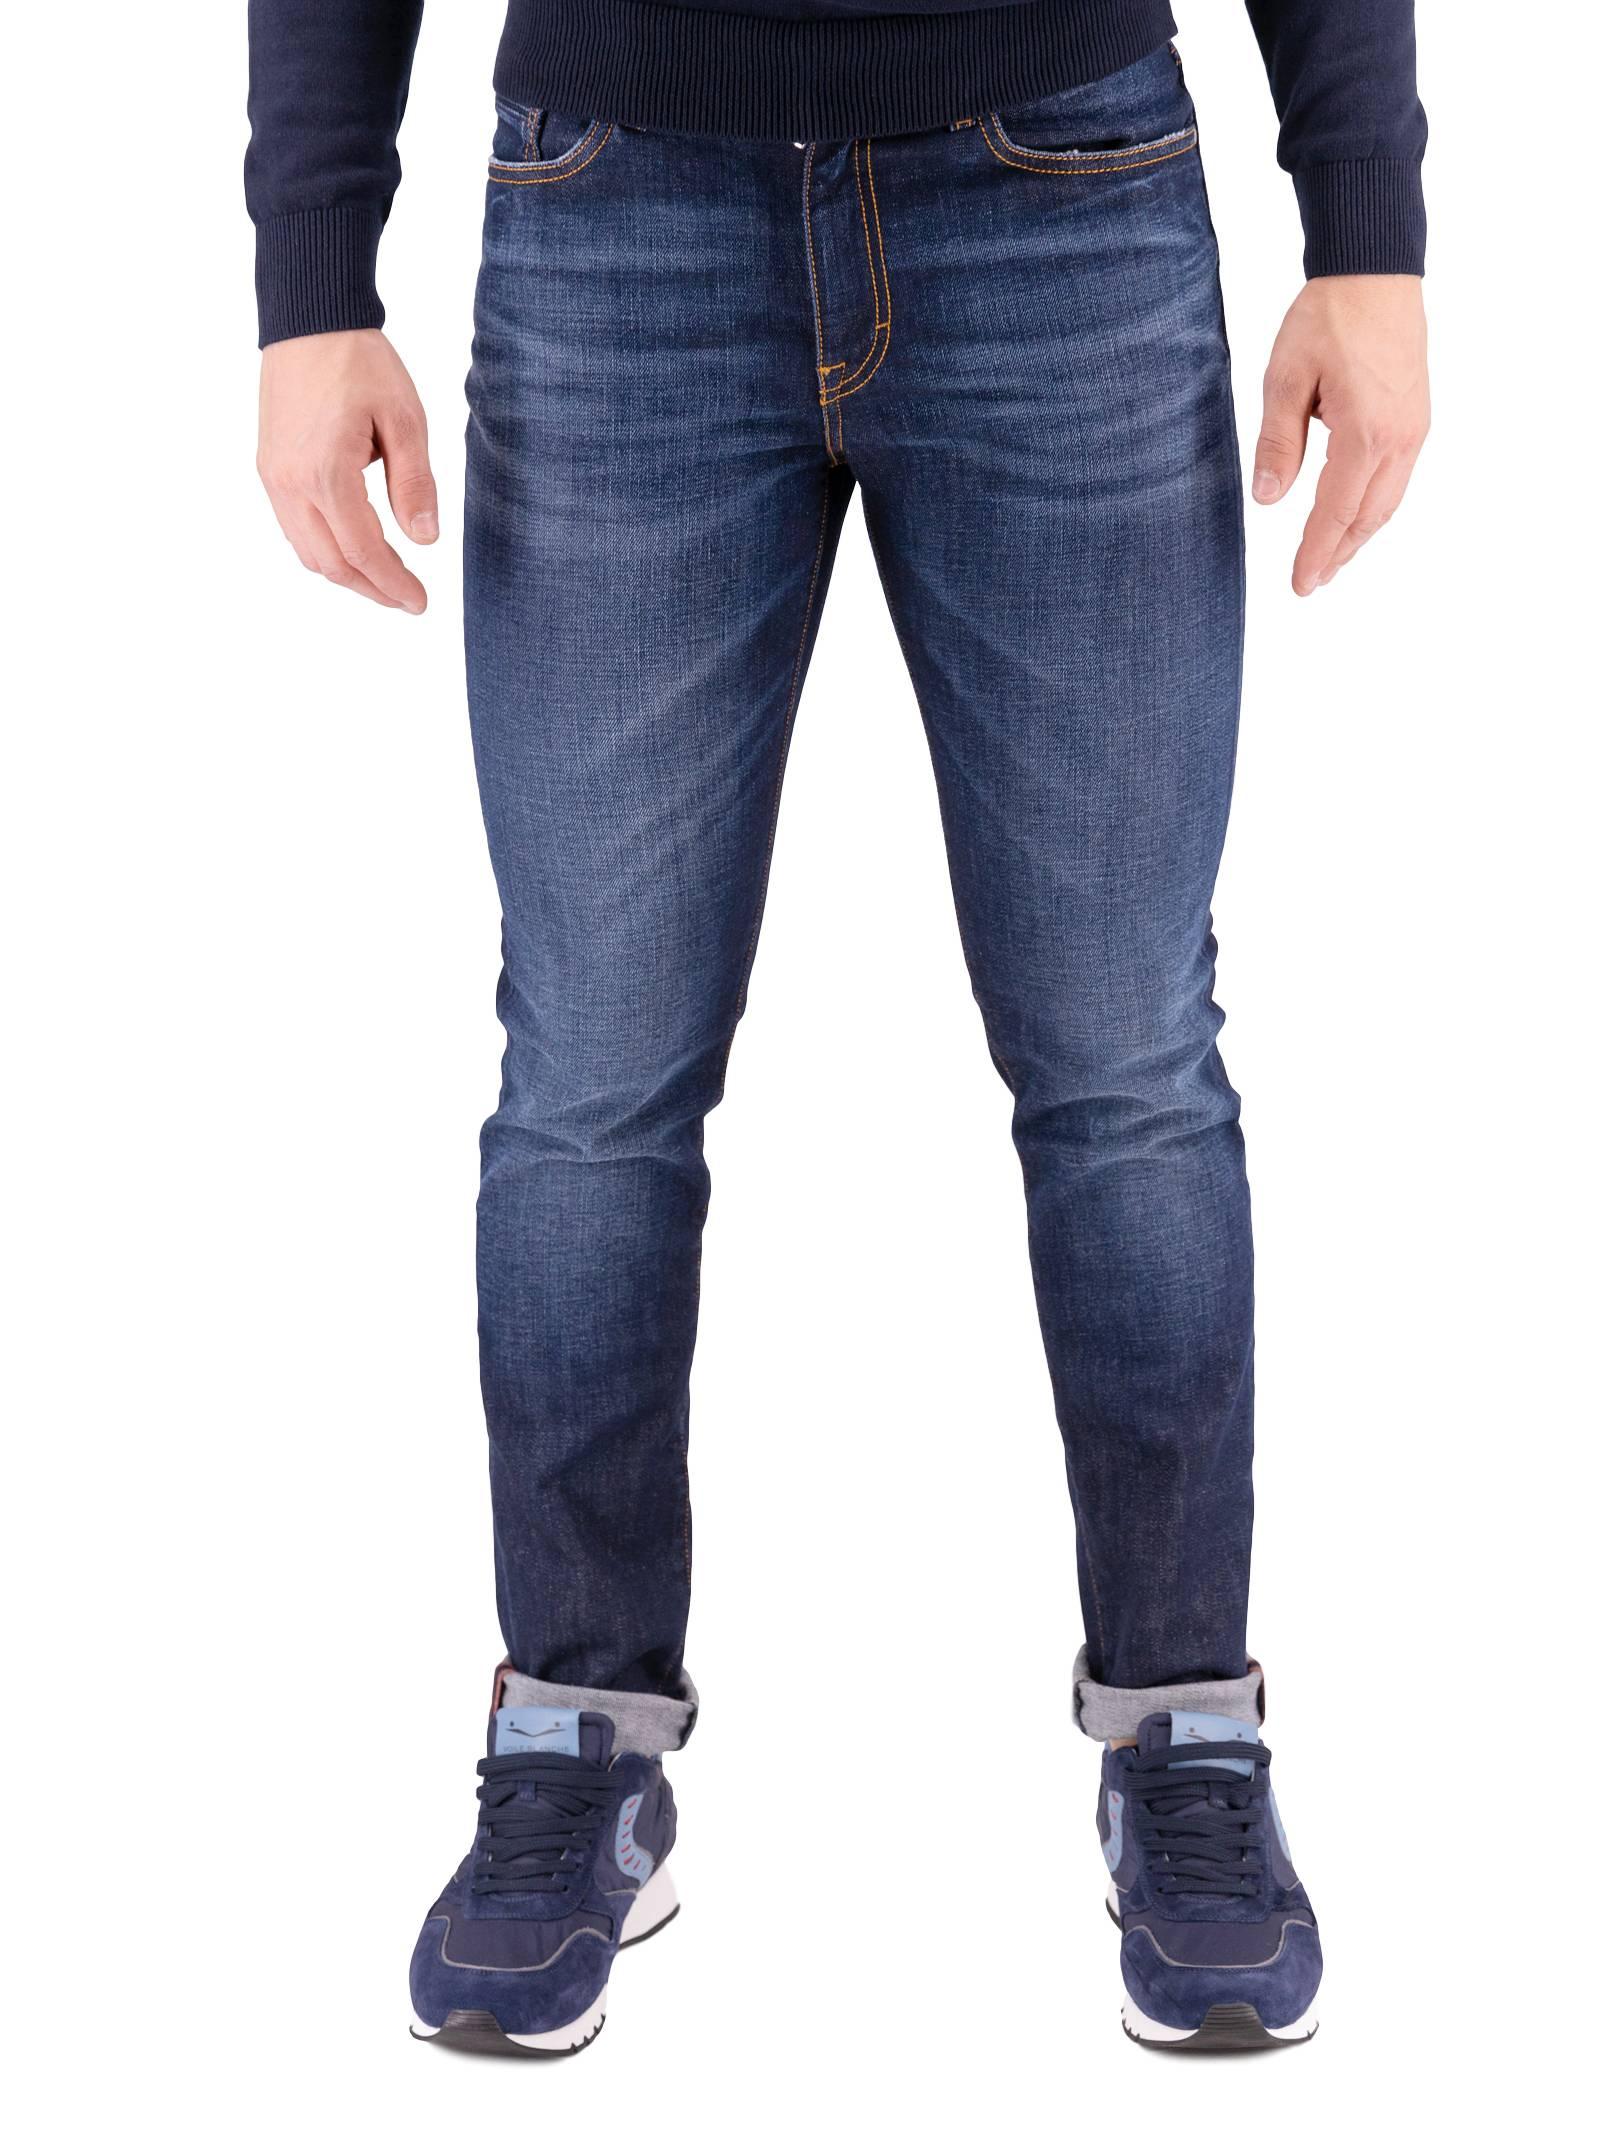 Teleria Zed Jeans Cobra F17 DHY